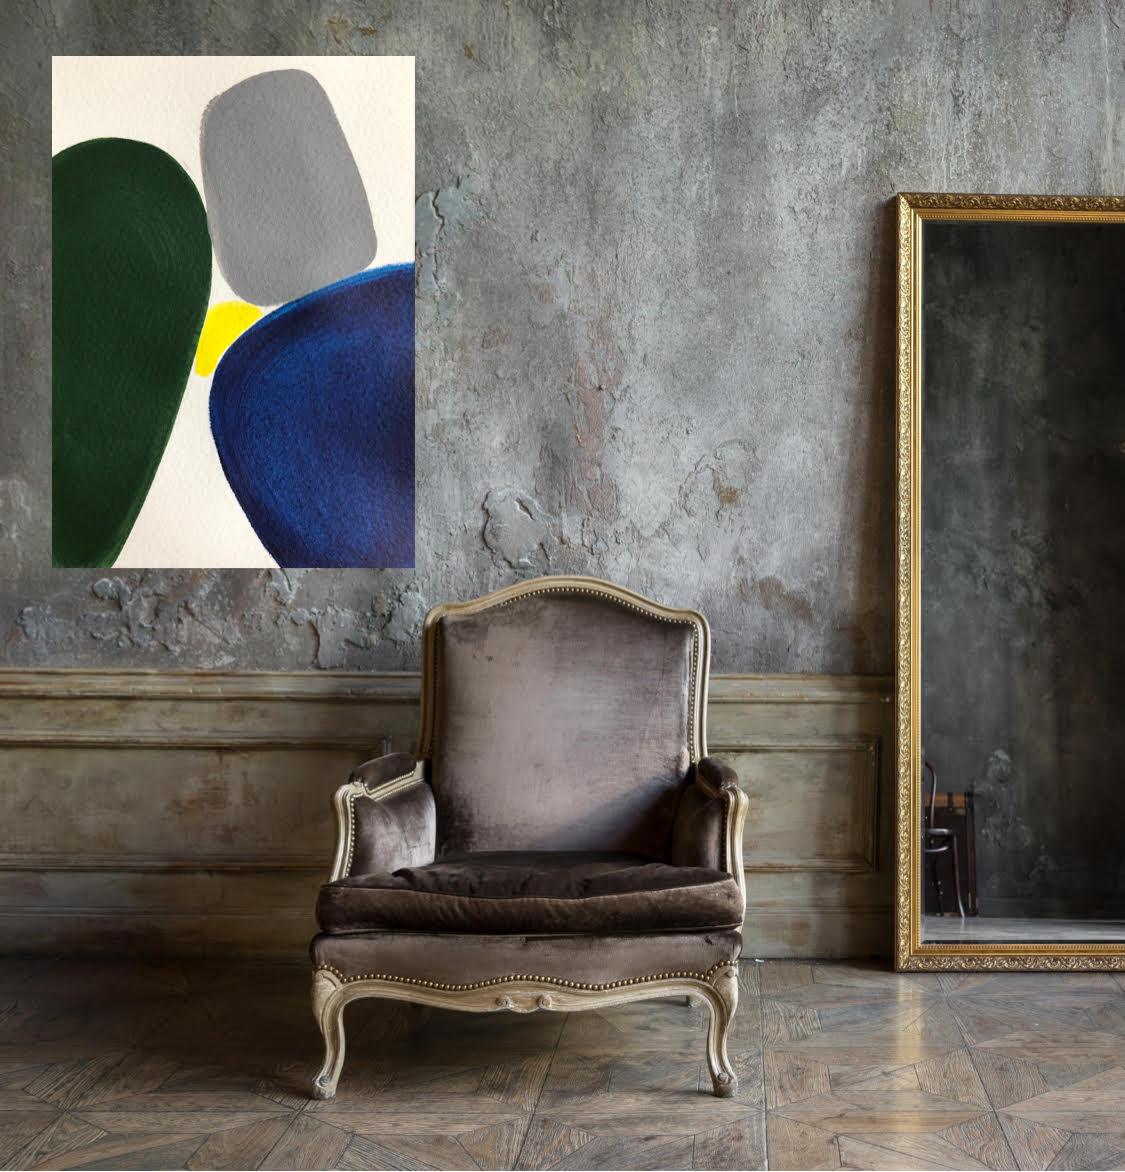 Lanaalsamirdiamond Letsdothis Grey Chair